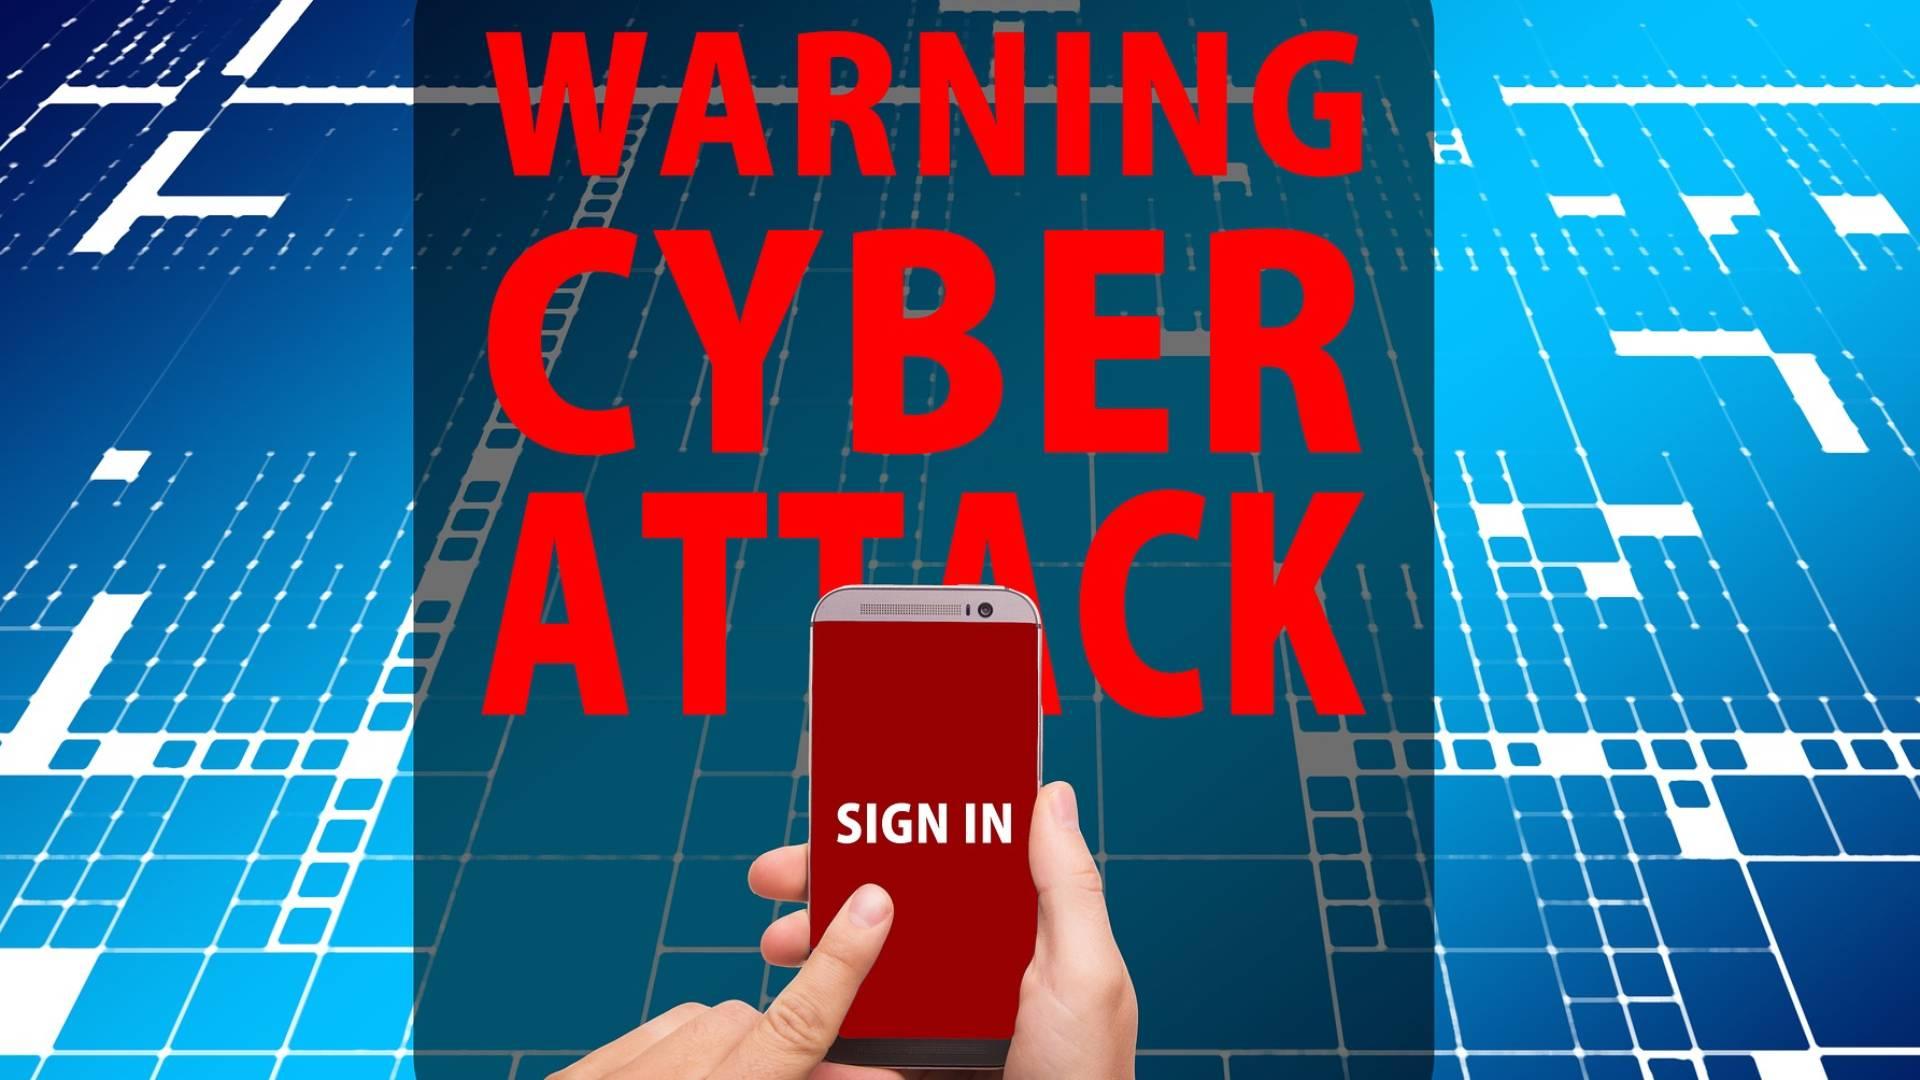 Clevere Malware beschädigt Millionen Android-Smartphones, 29 Android-Apps und 36 Roku-Apps betroffen